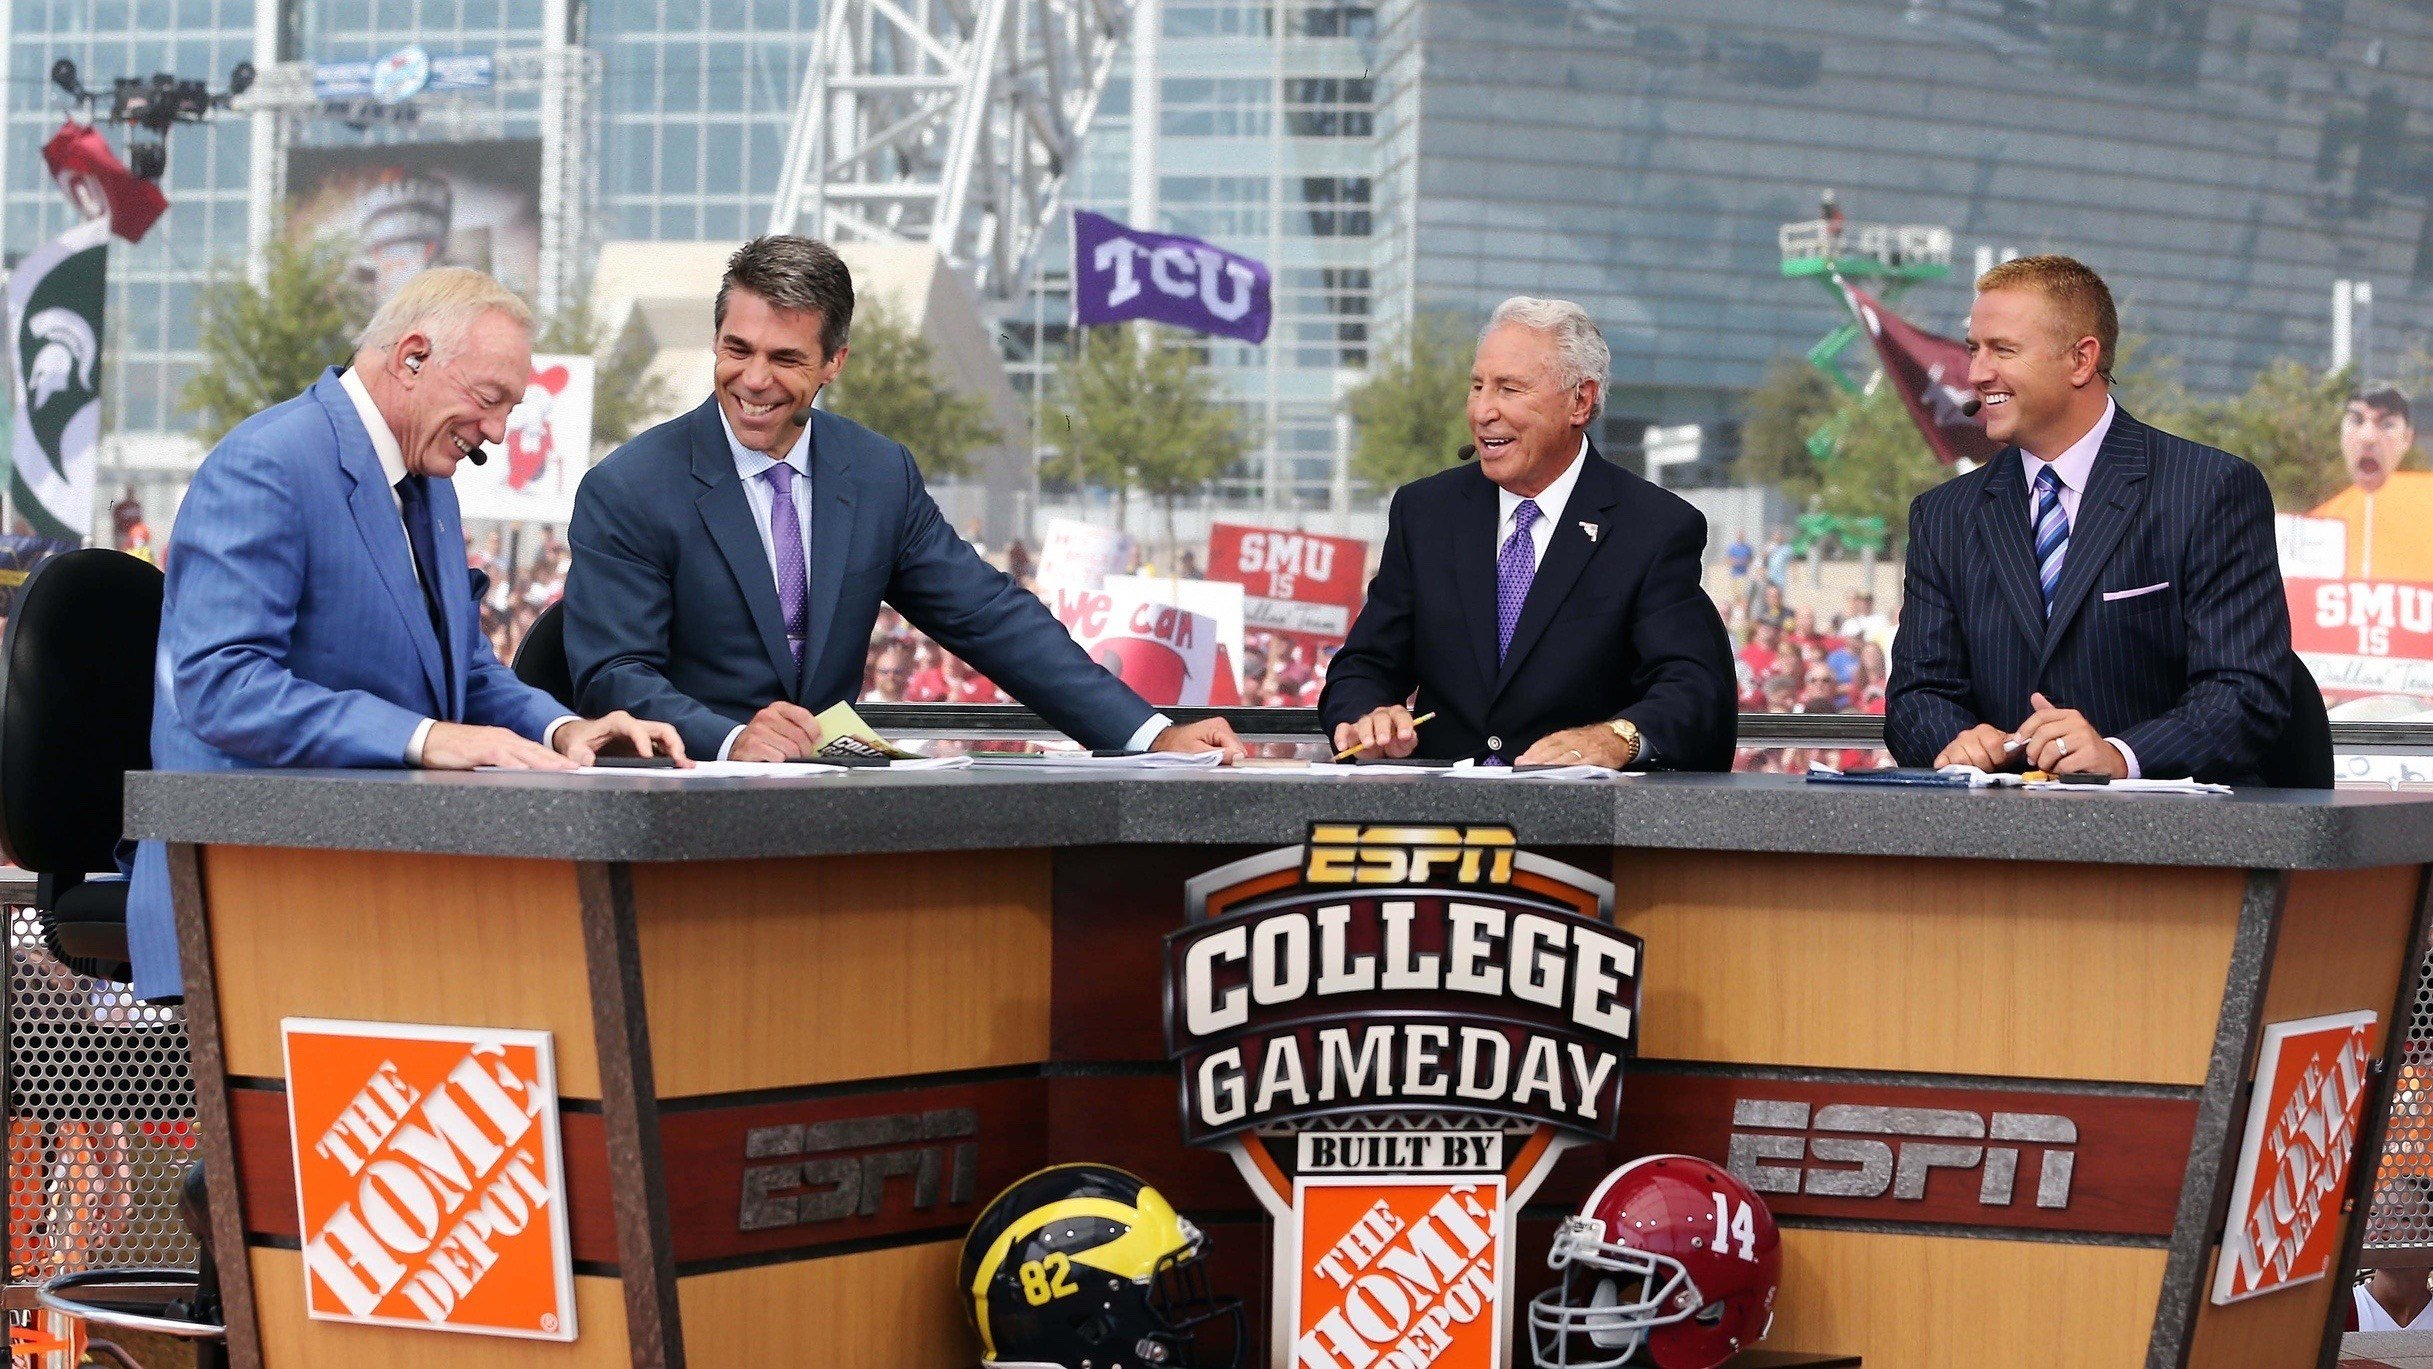 ESPN photo.